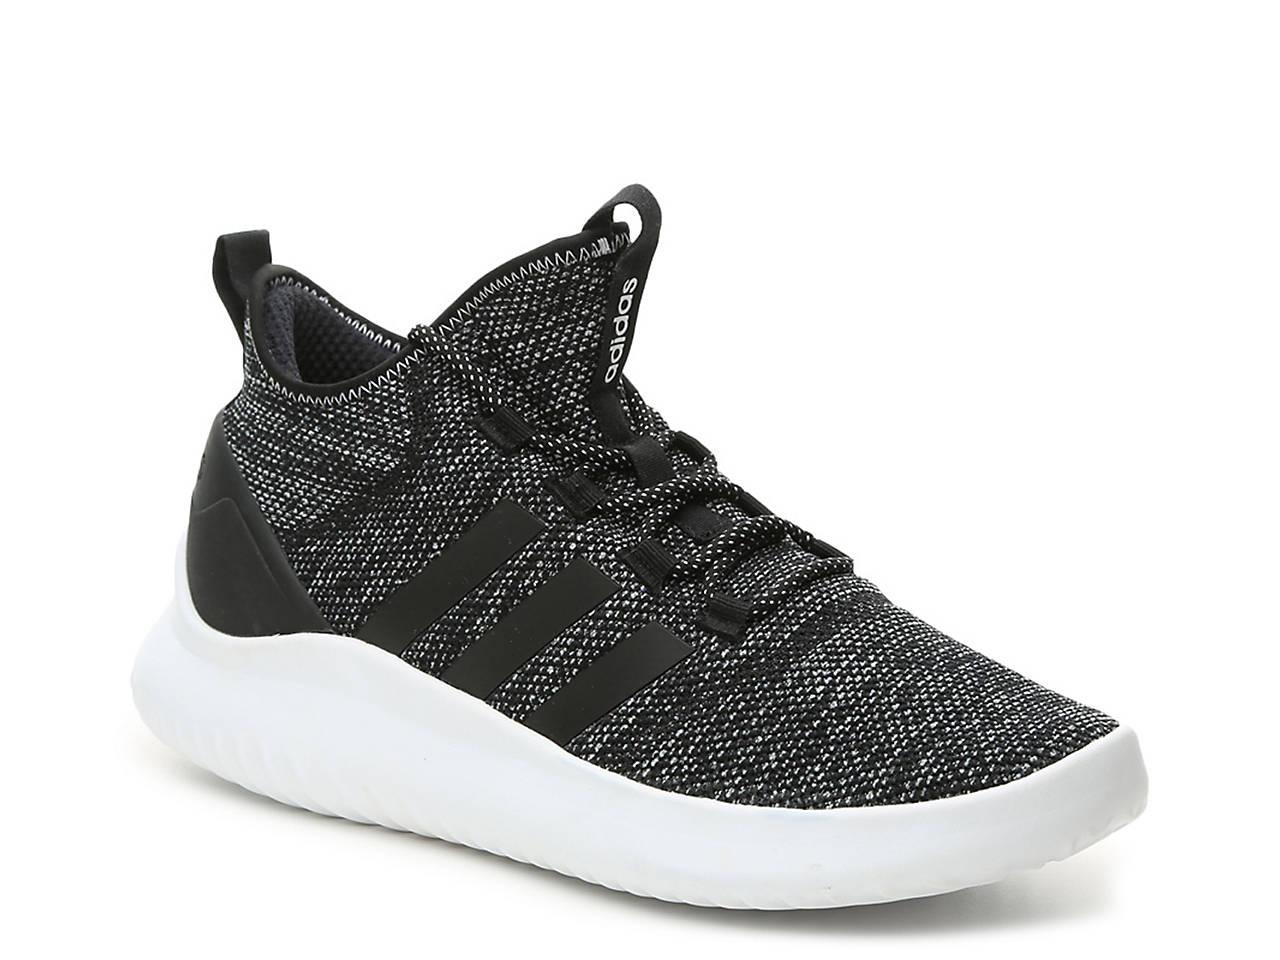 adidas Cloudfoam Ultimate BBALL High-Top Sneaker - Men s Men s Shoes ... 026d60428